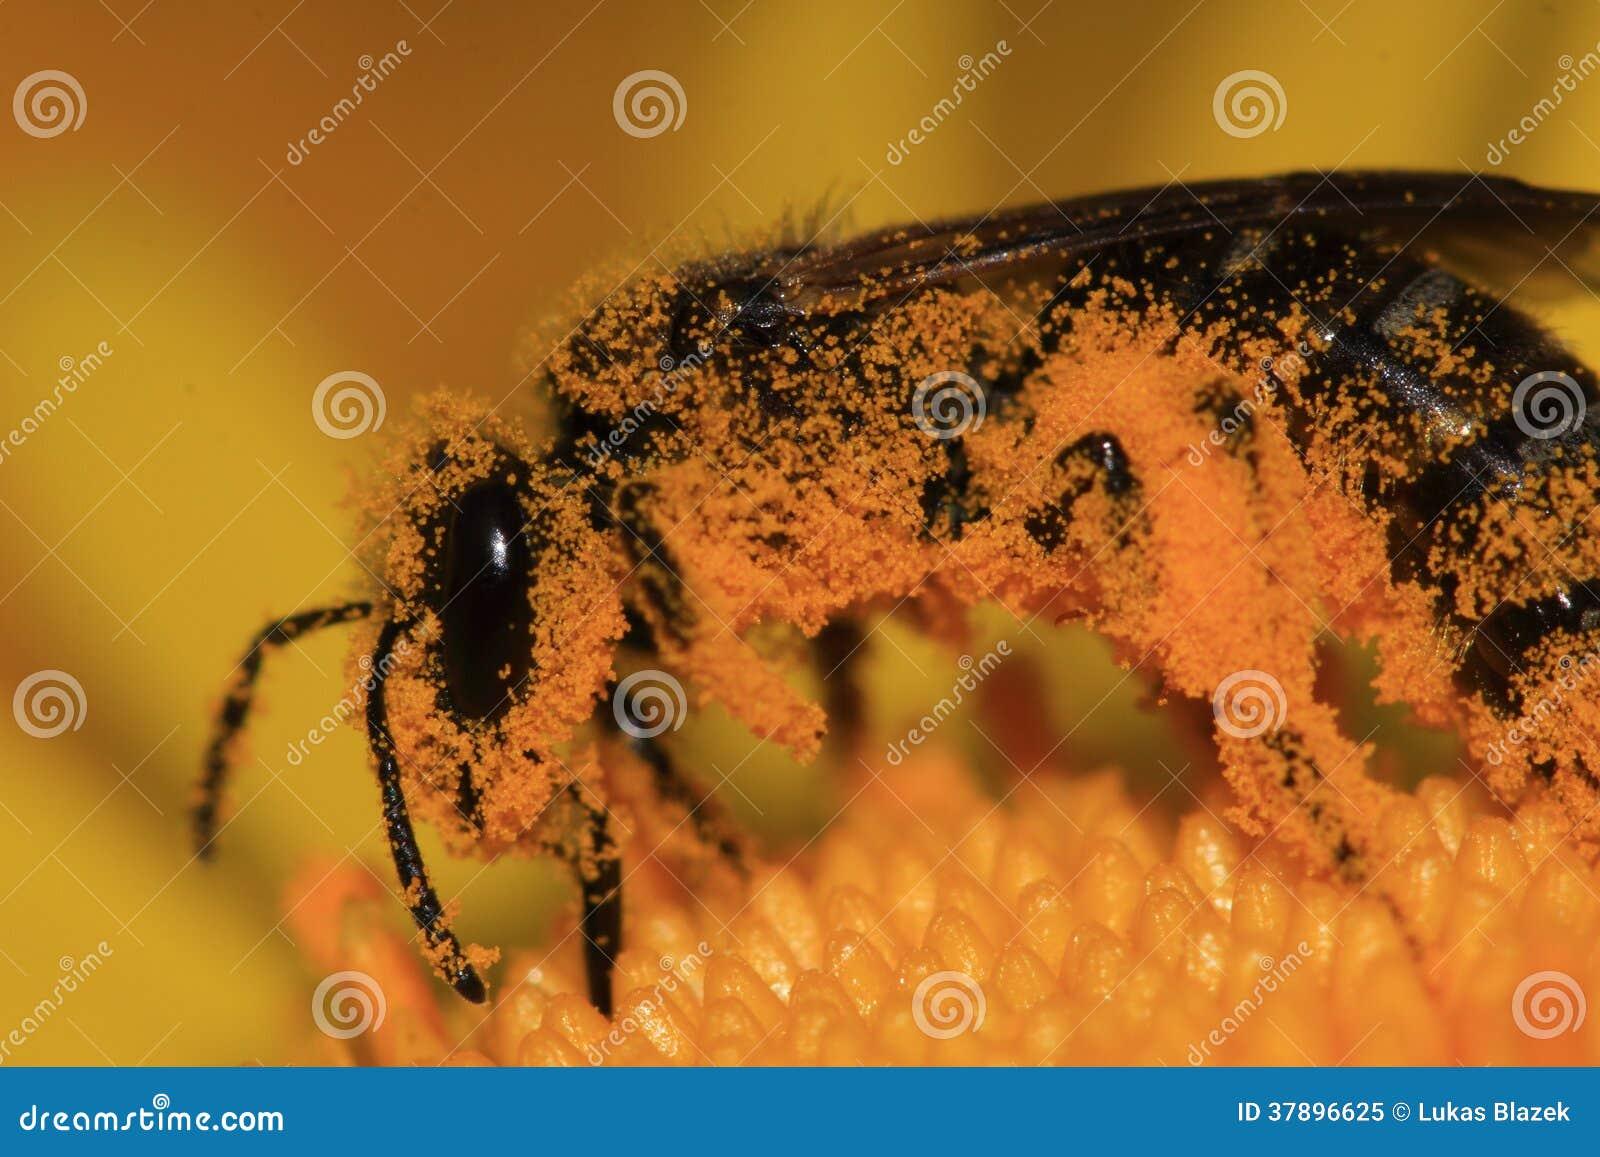 Europese honingbij